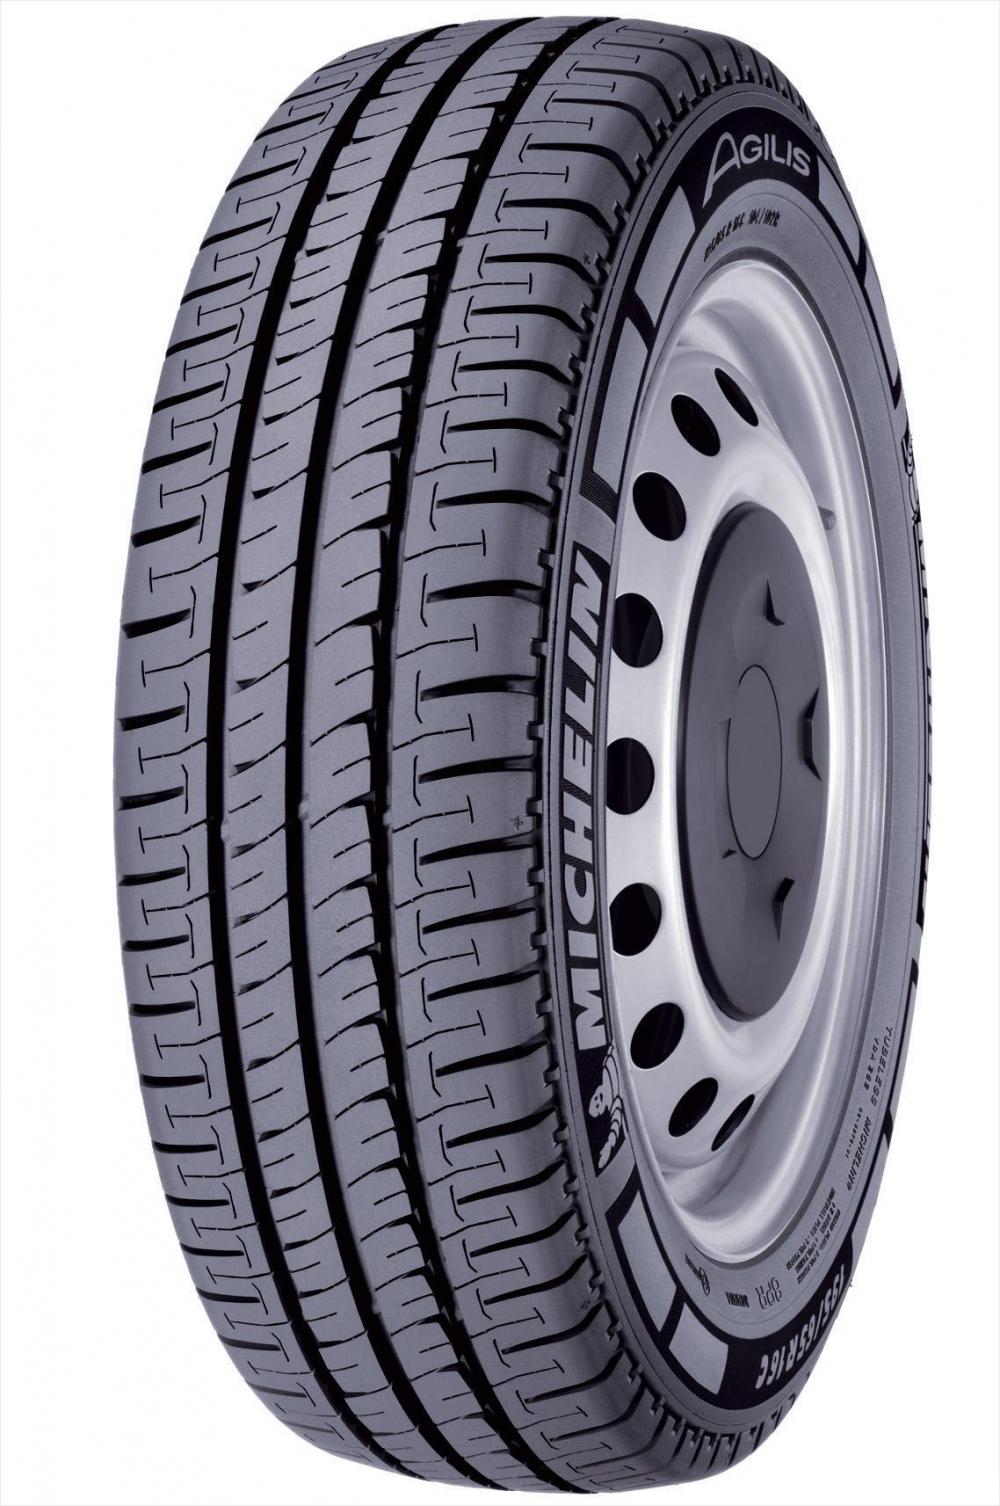 Michelin AGILISPLUS pneumatika